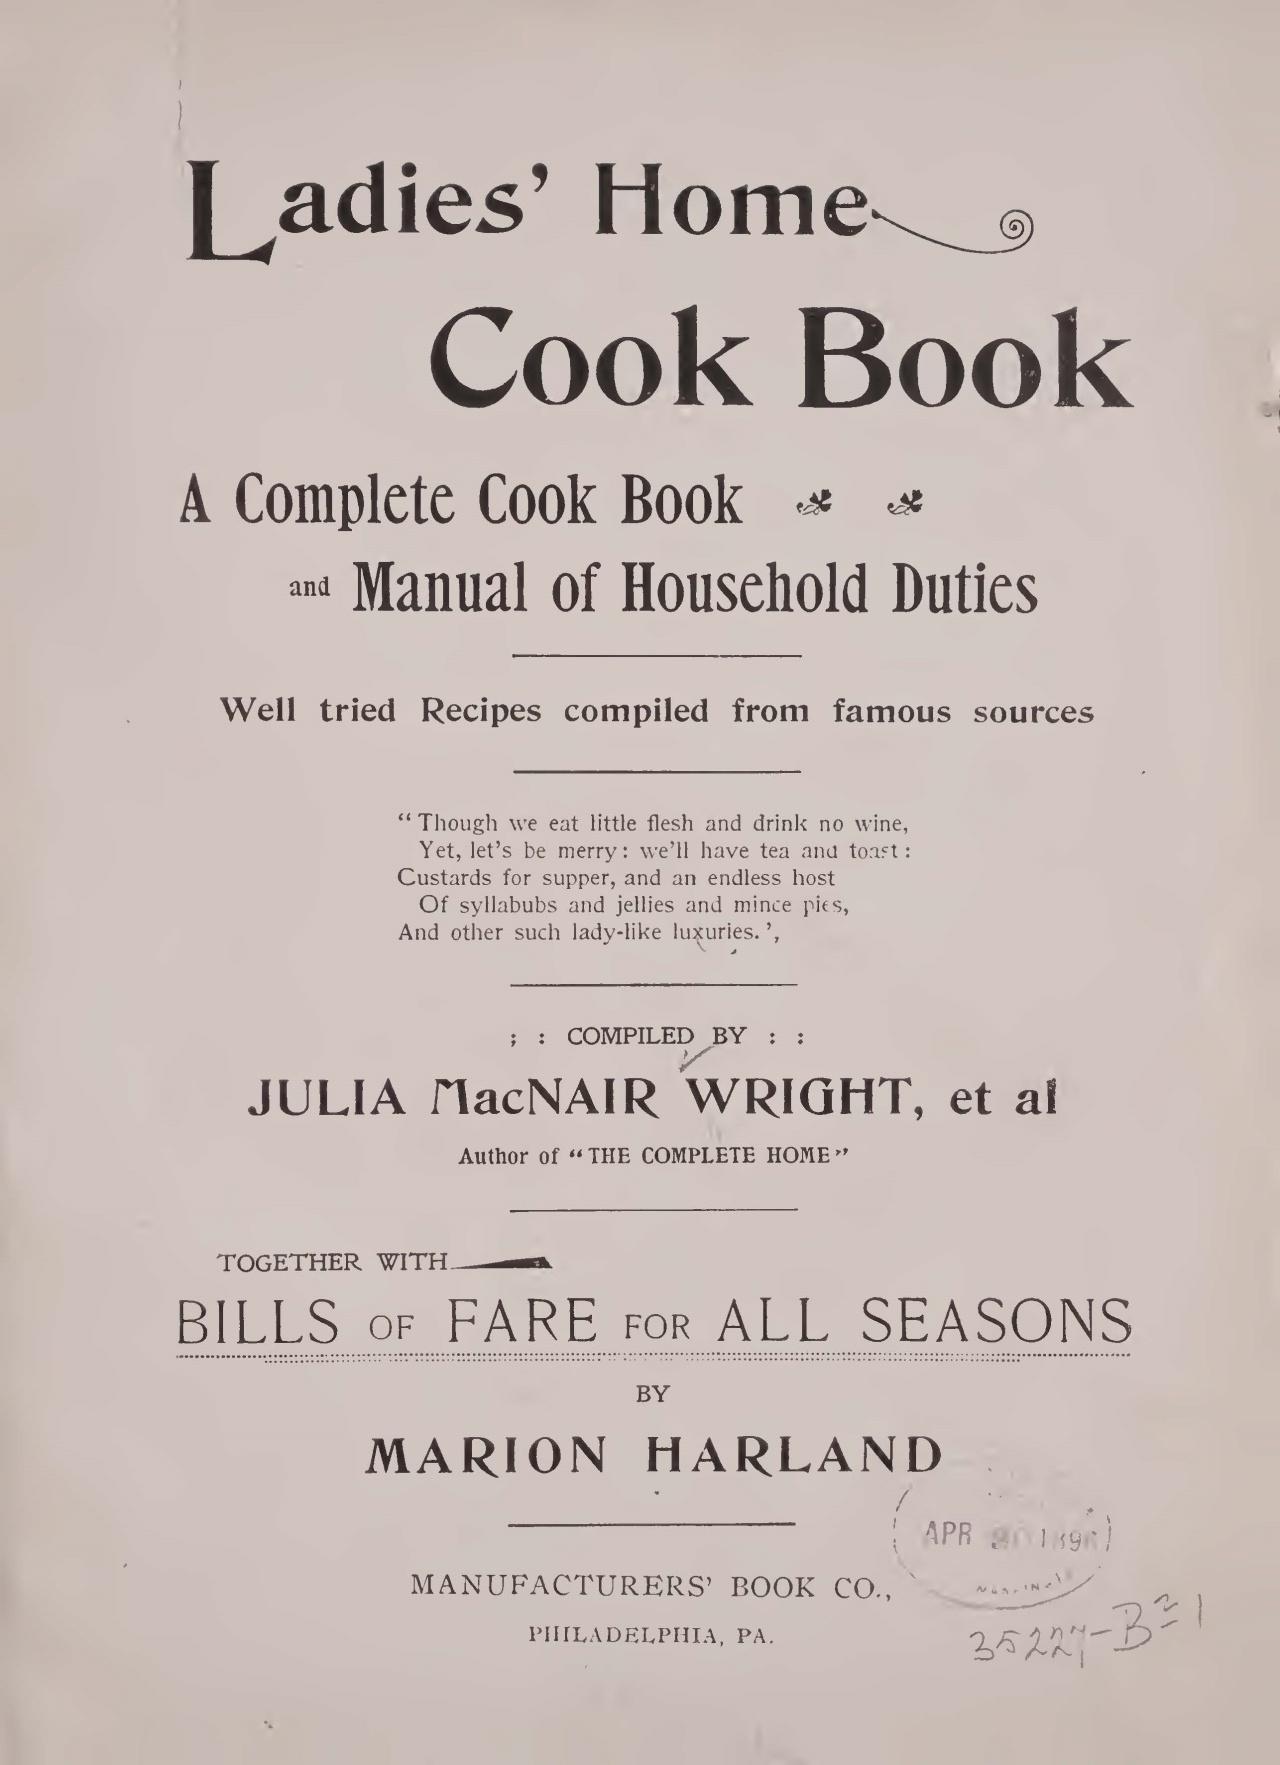 Wright, Julia McNair, Ladies Home Cook Book Title Page.jpg